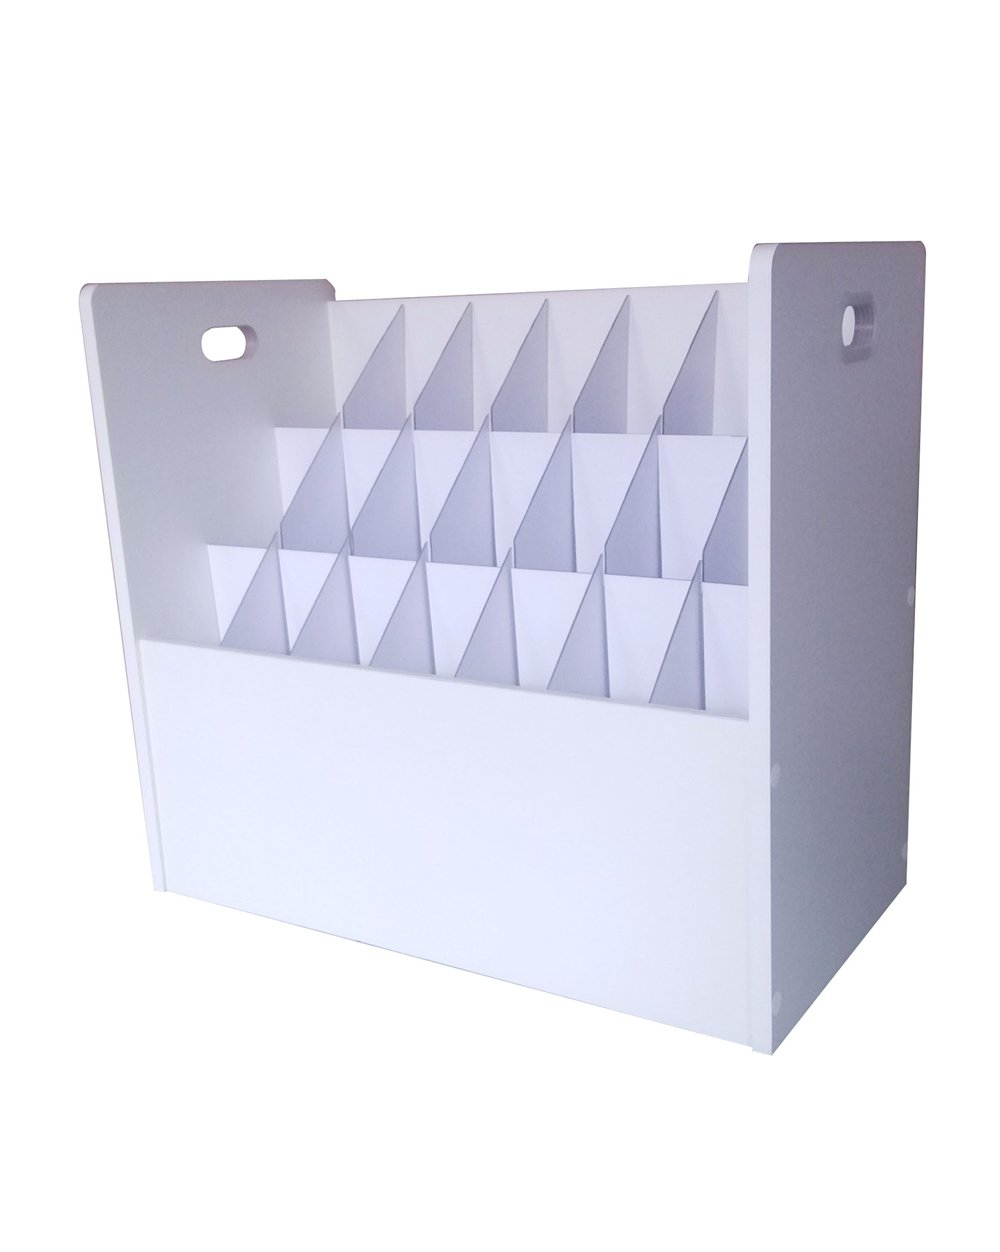 FixtureDisplays 21 compartments file organizer15126 15126 by FixtureDisplays